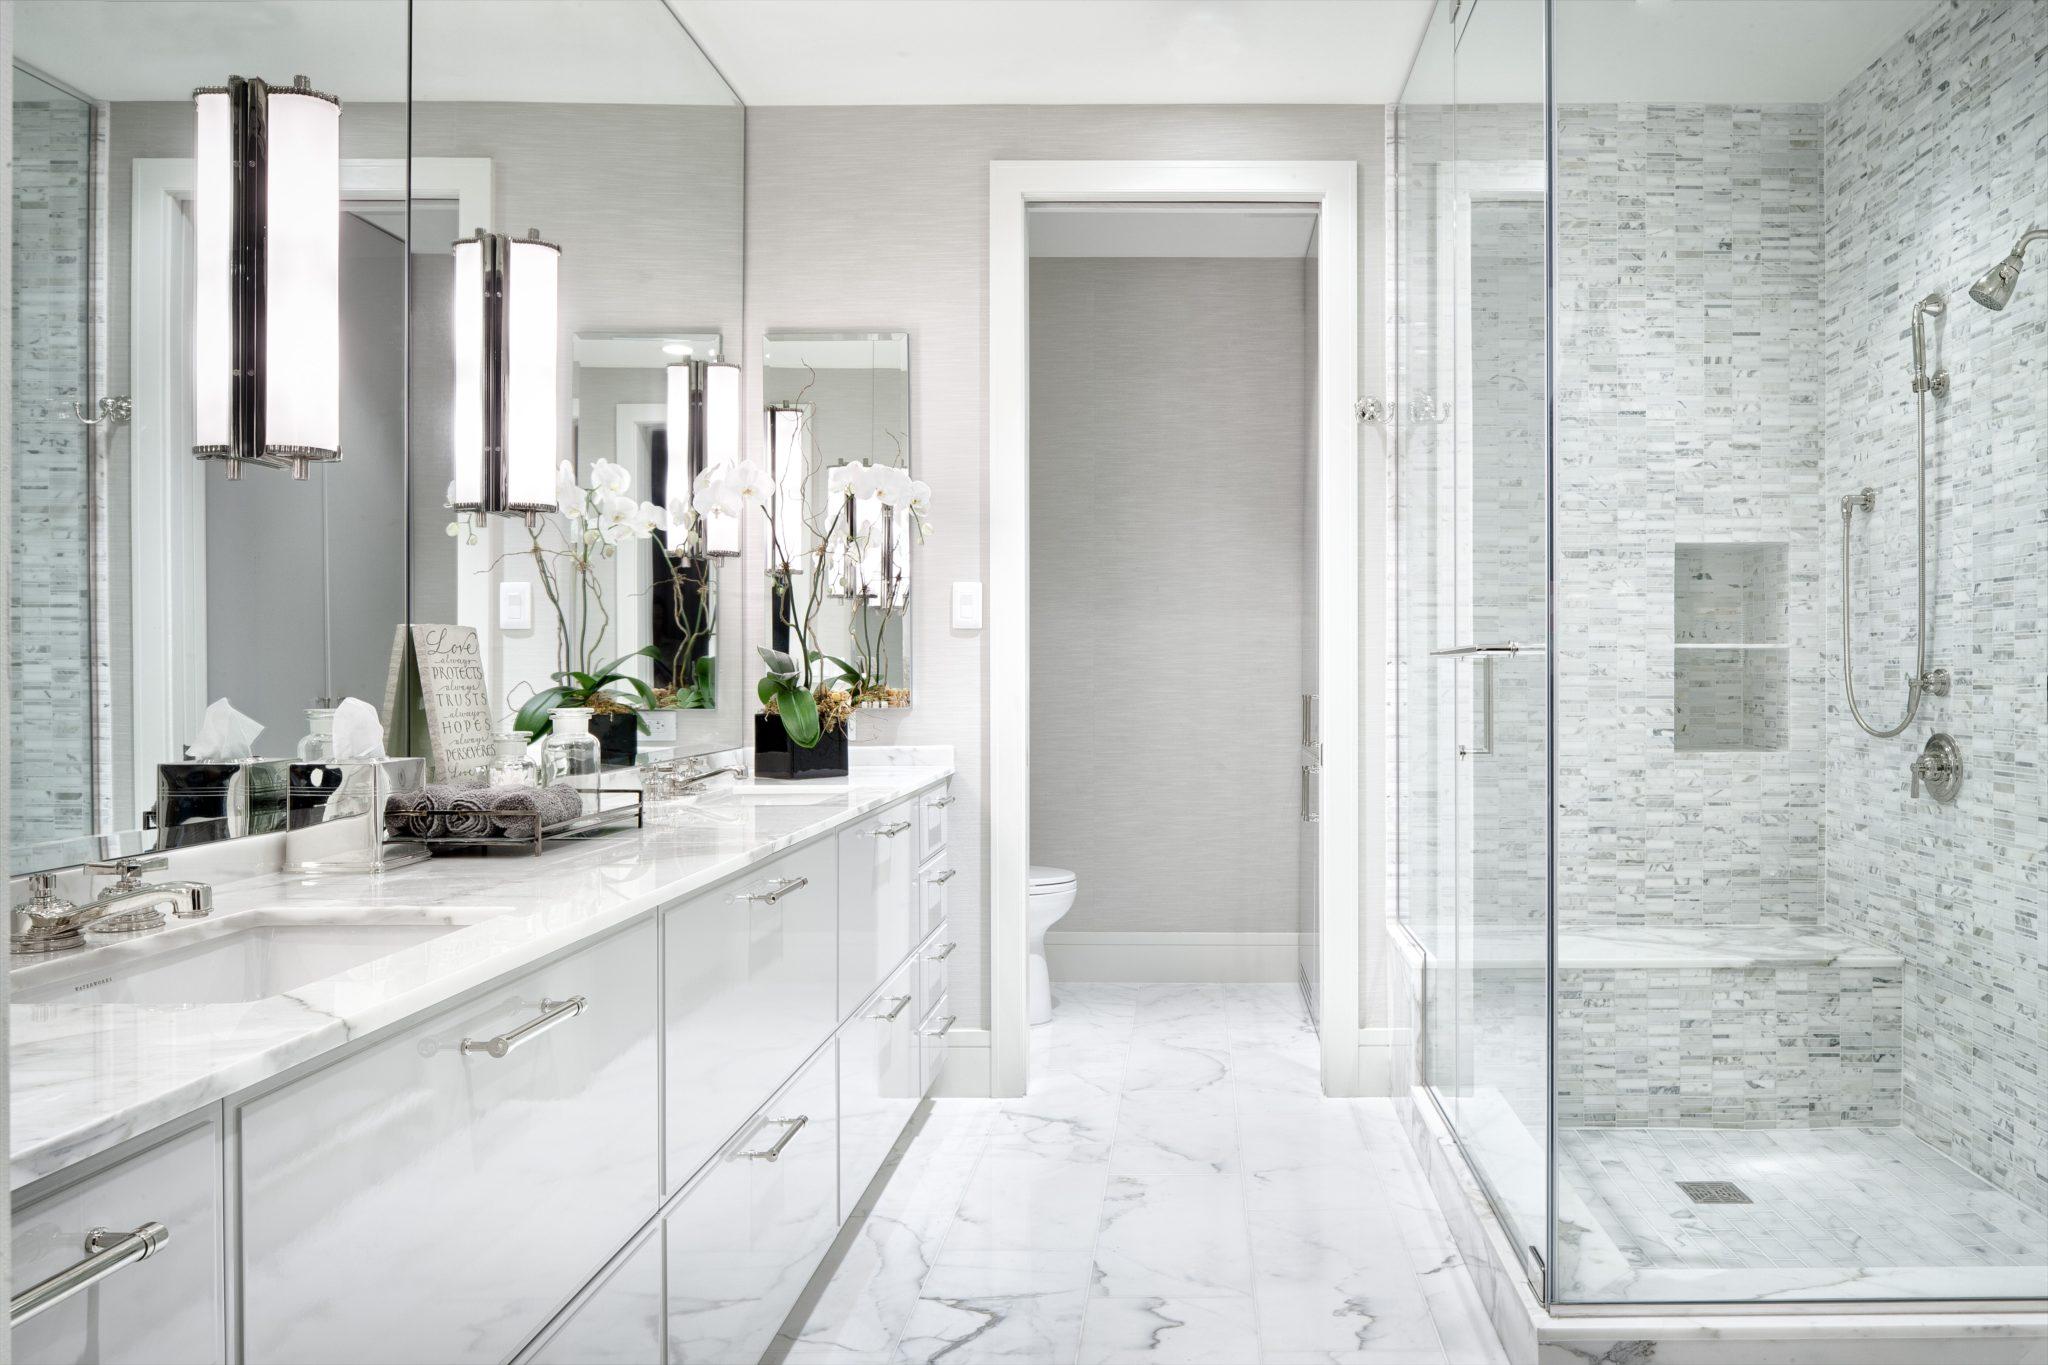 White Modern Master Bathroom - The Austonian, Austin, TX. By Greer Interior Design